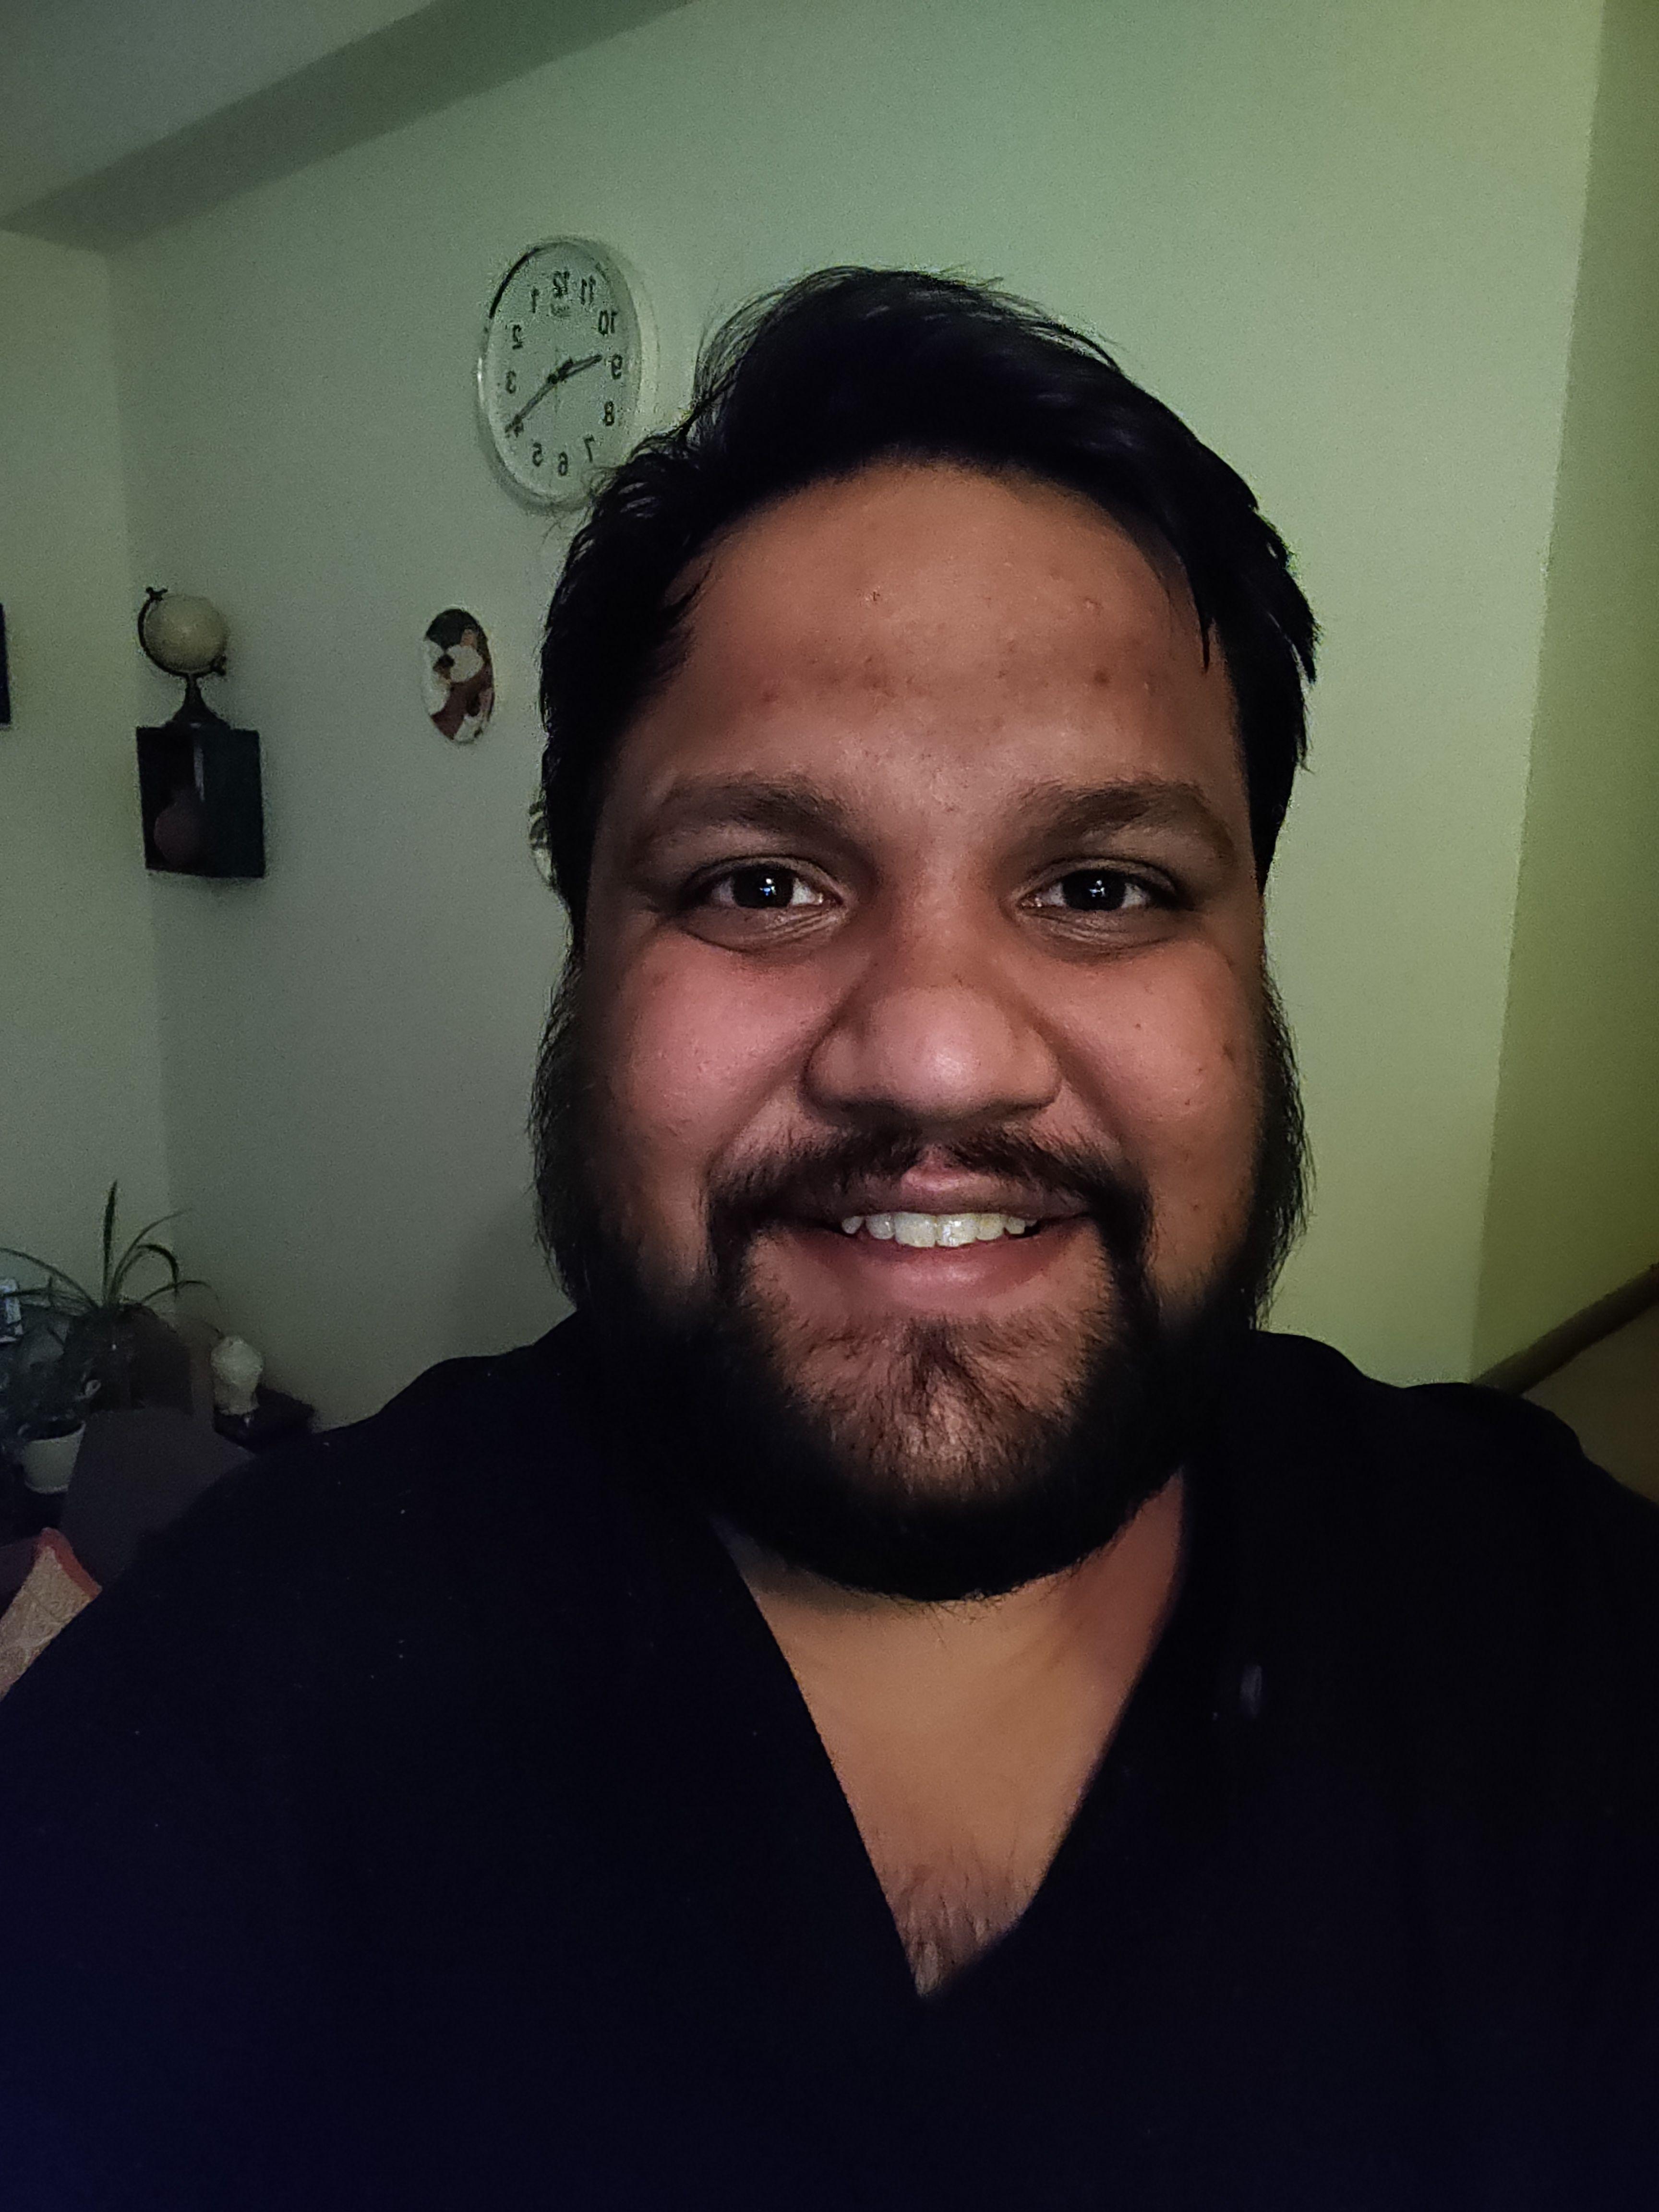 OnePlus Nord CE 5G Camera Low Light Selfie